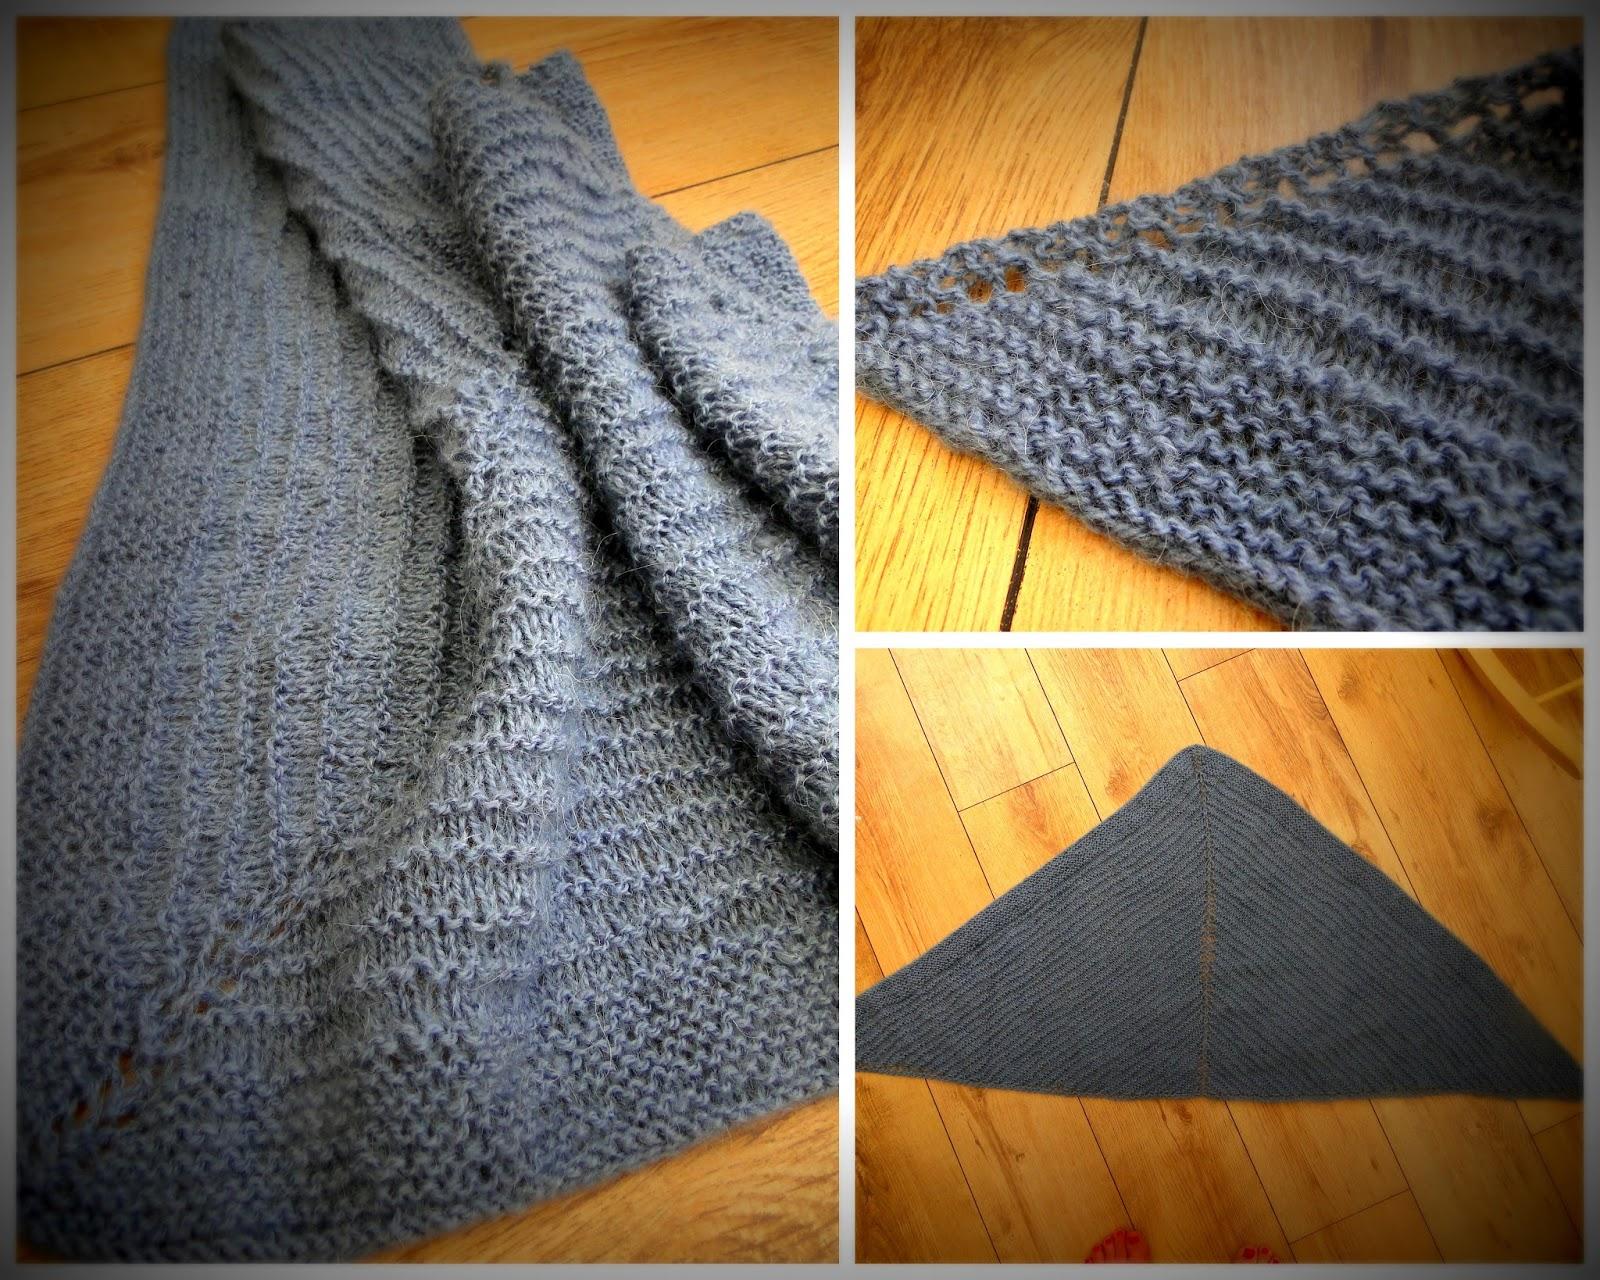 3 Rabbits Patterns: Very easy FREE Shawl knitting pattern